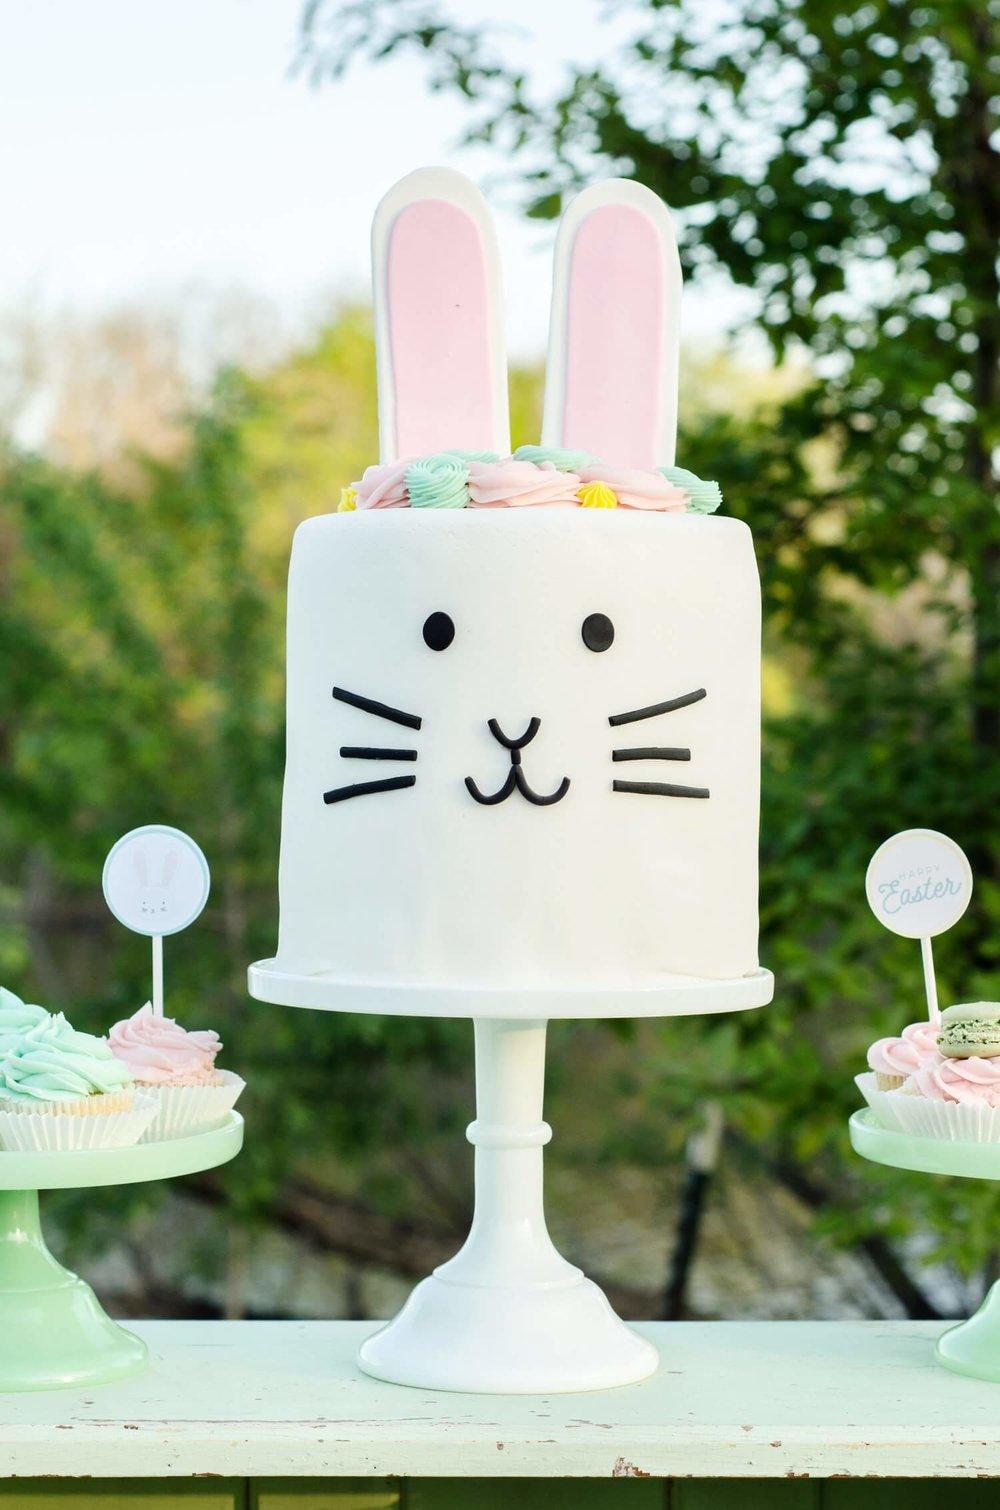 Easter dessert table ideas / Easter dessert table for kids /Easter dessert idea / Easter cake idea / Bunny cake idea / Styled by MINT Event Design / www.minteventdesign.com